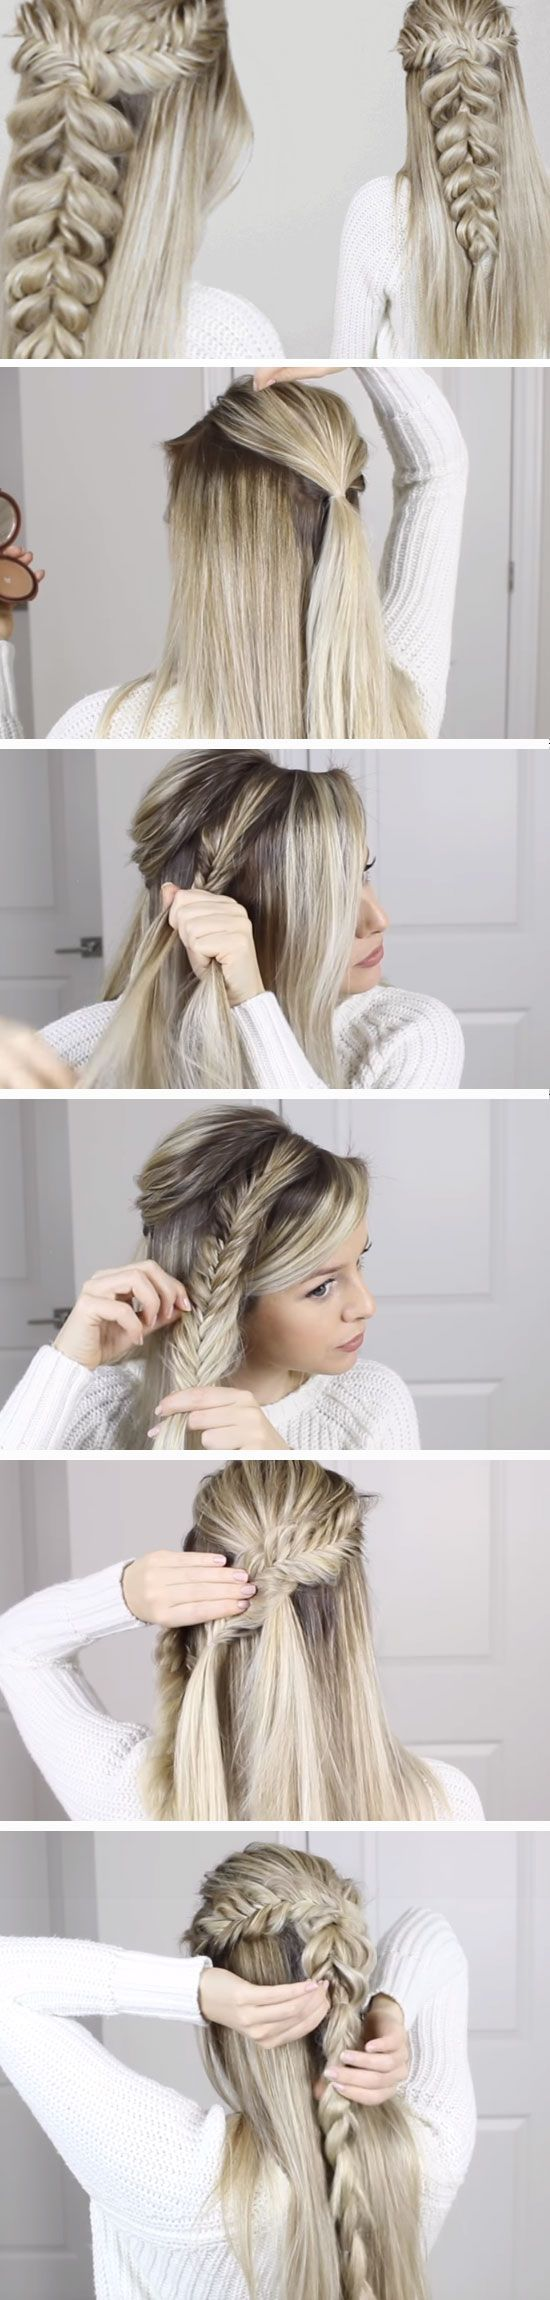 Easy DIY Wedding Hairstyles for Long Hair | Bridesmaid hairstyles ...